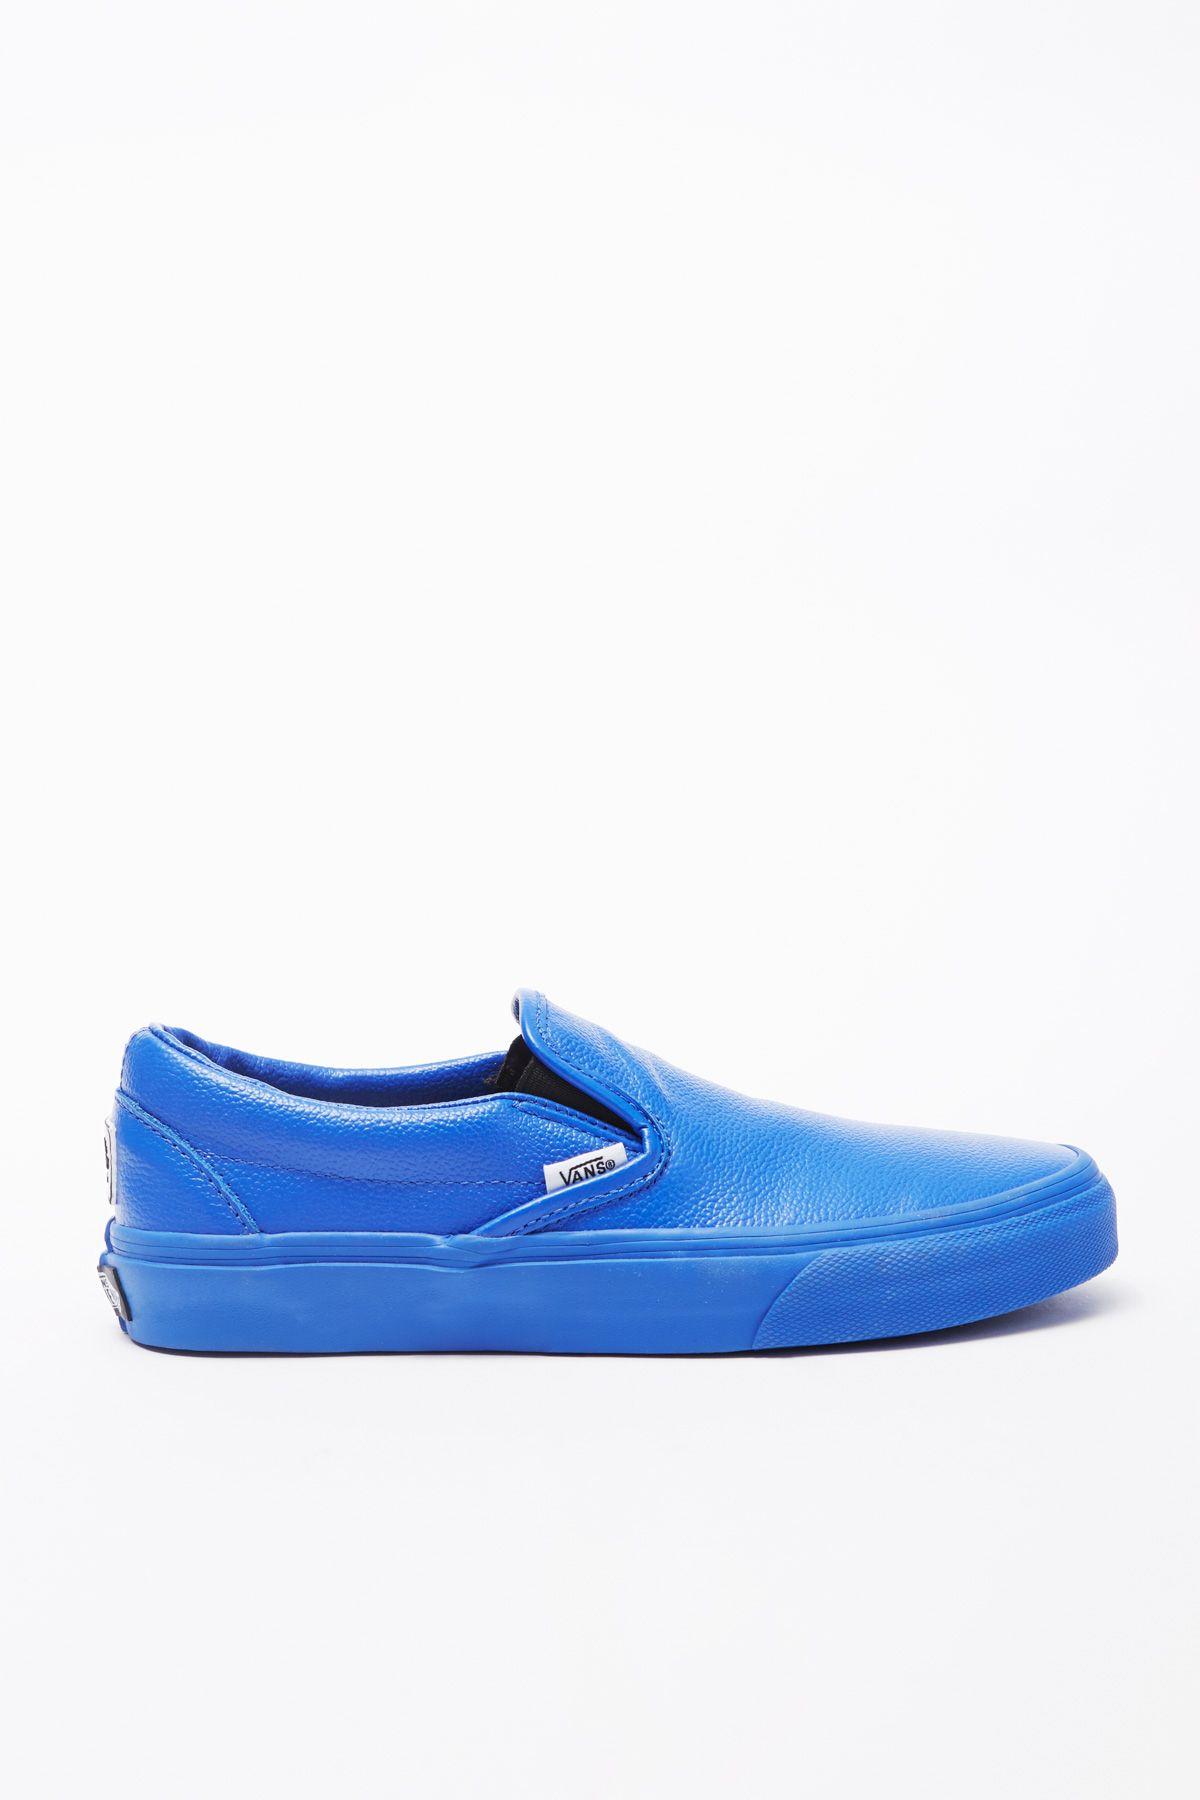 vans slip on blue leather